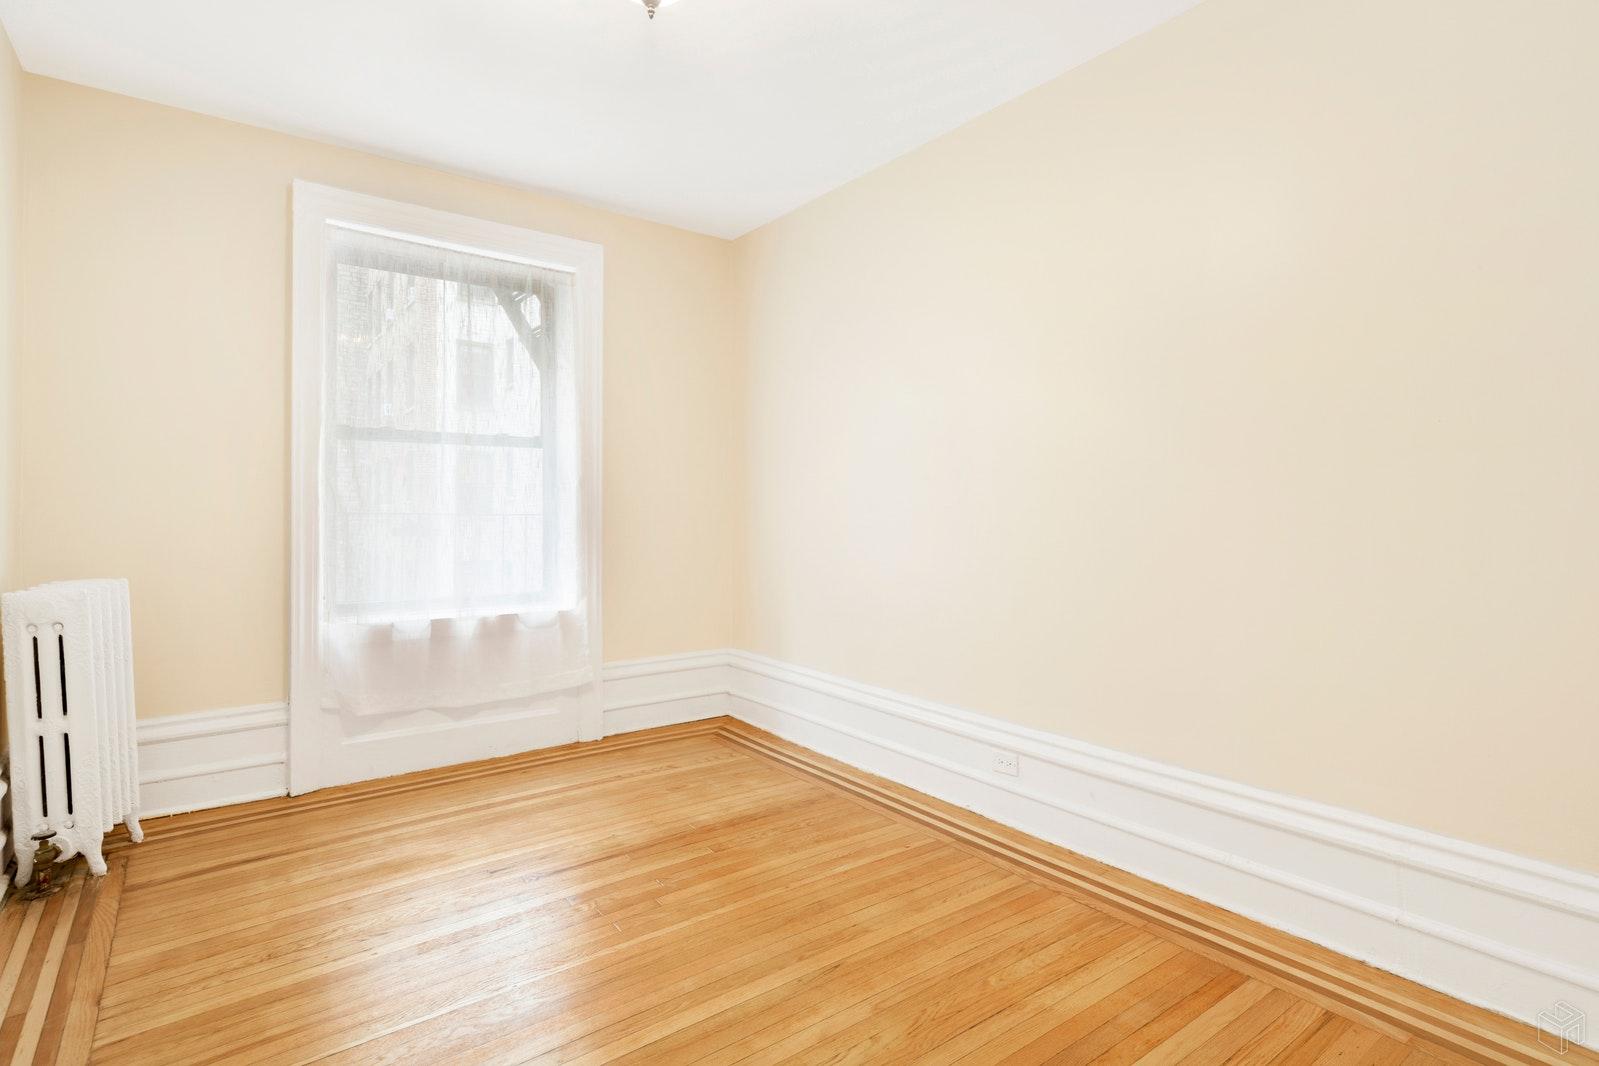 414 WEST 121ST STREET, East Harlem, $3,400, Web #: 19541855